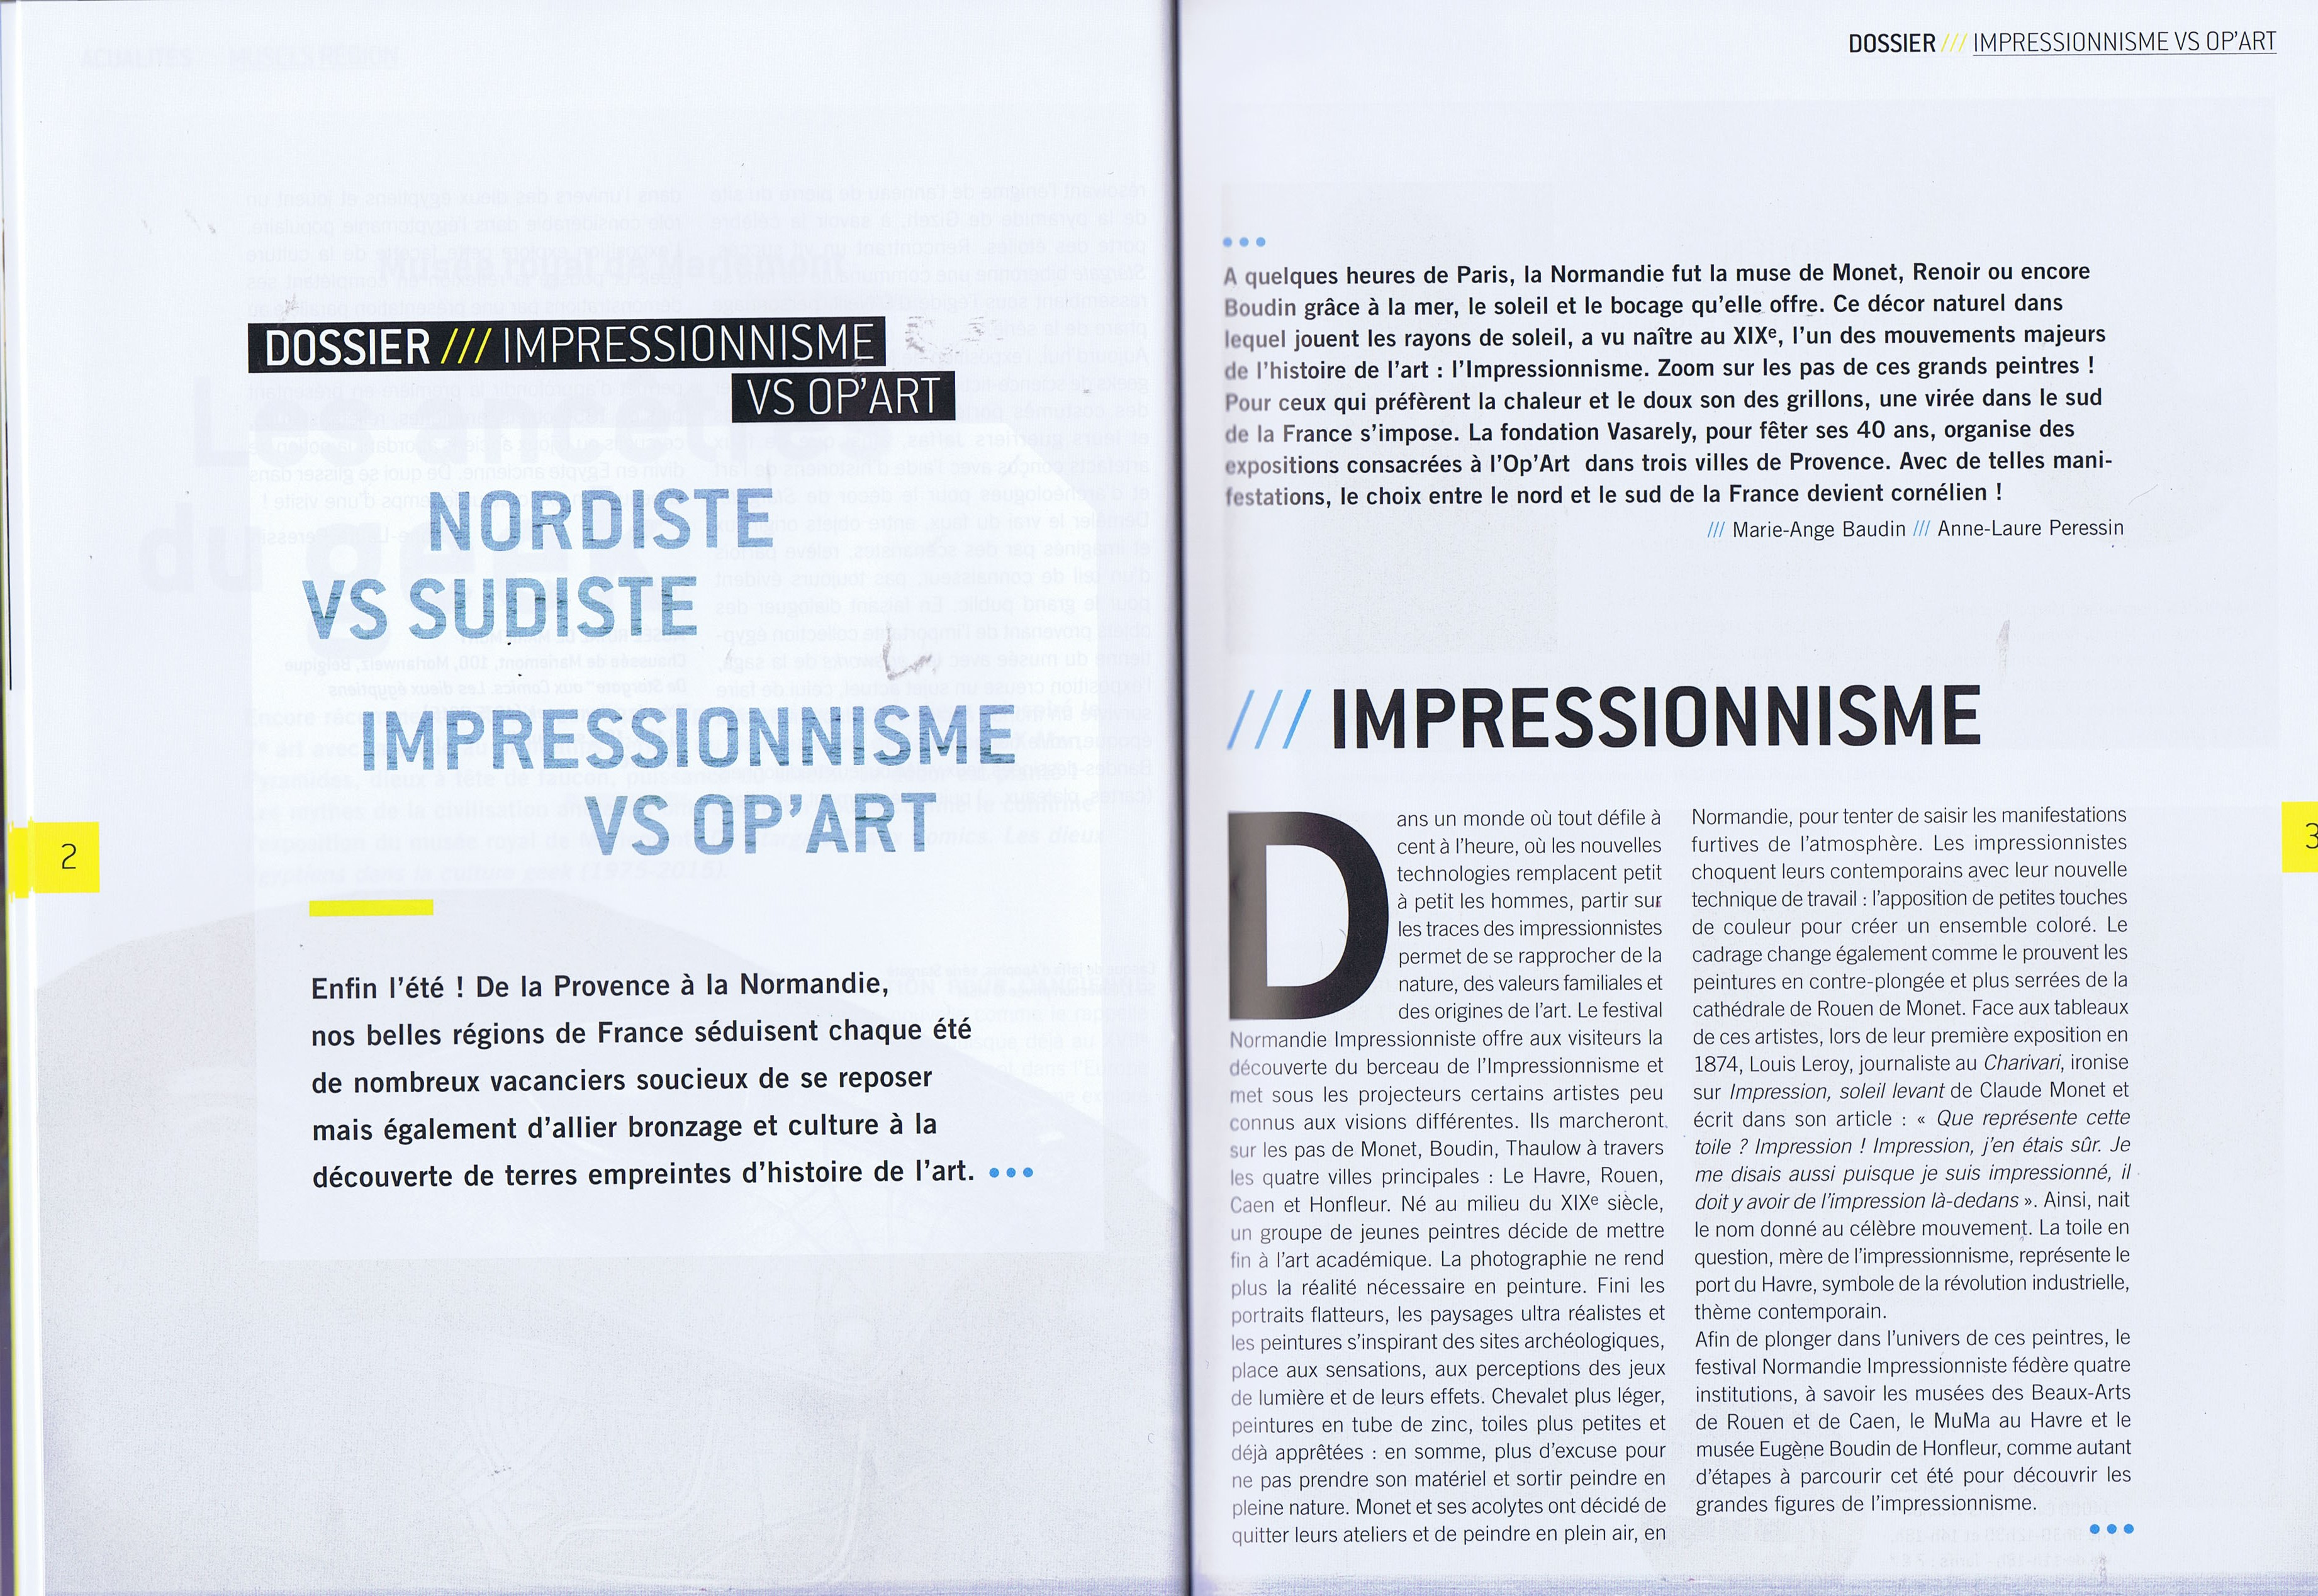 Dossier Impressionniste vs Op'Art